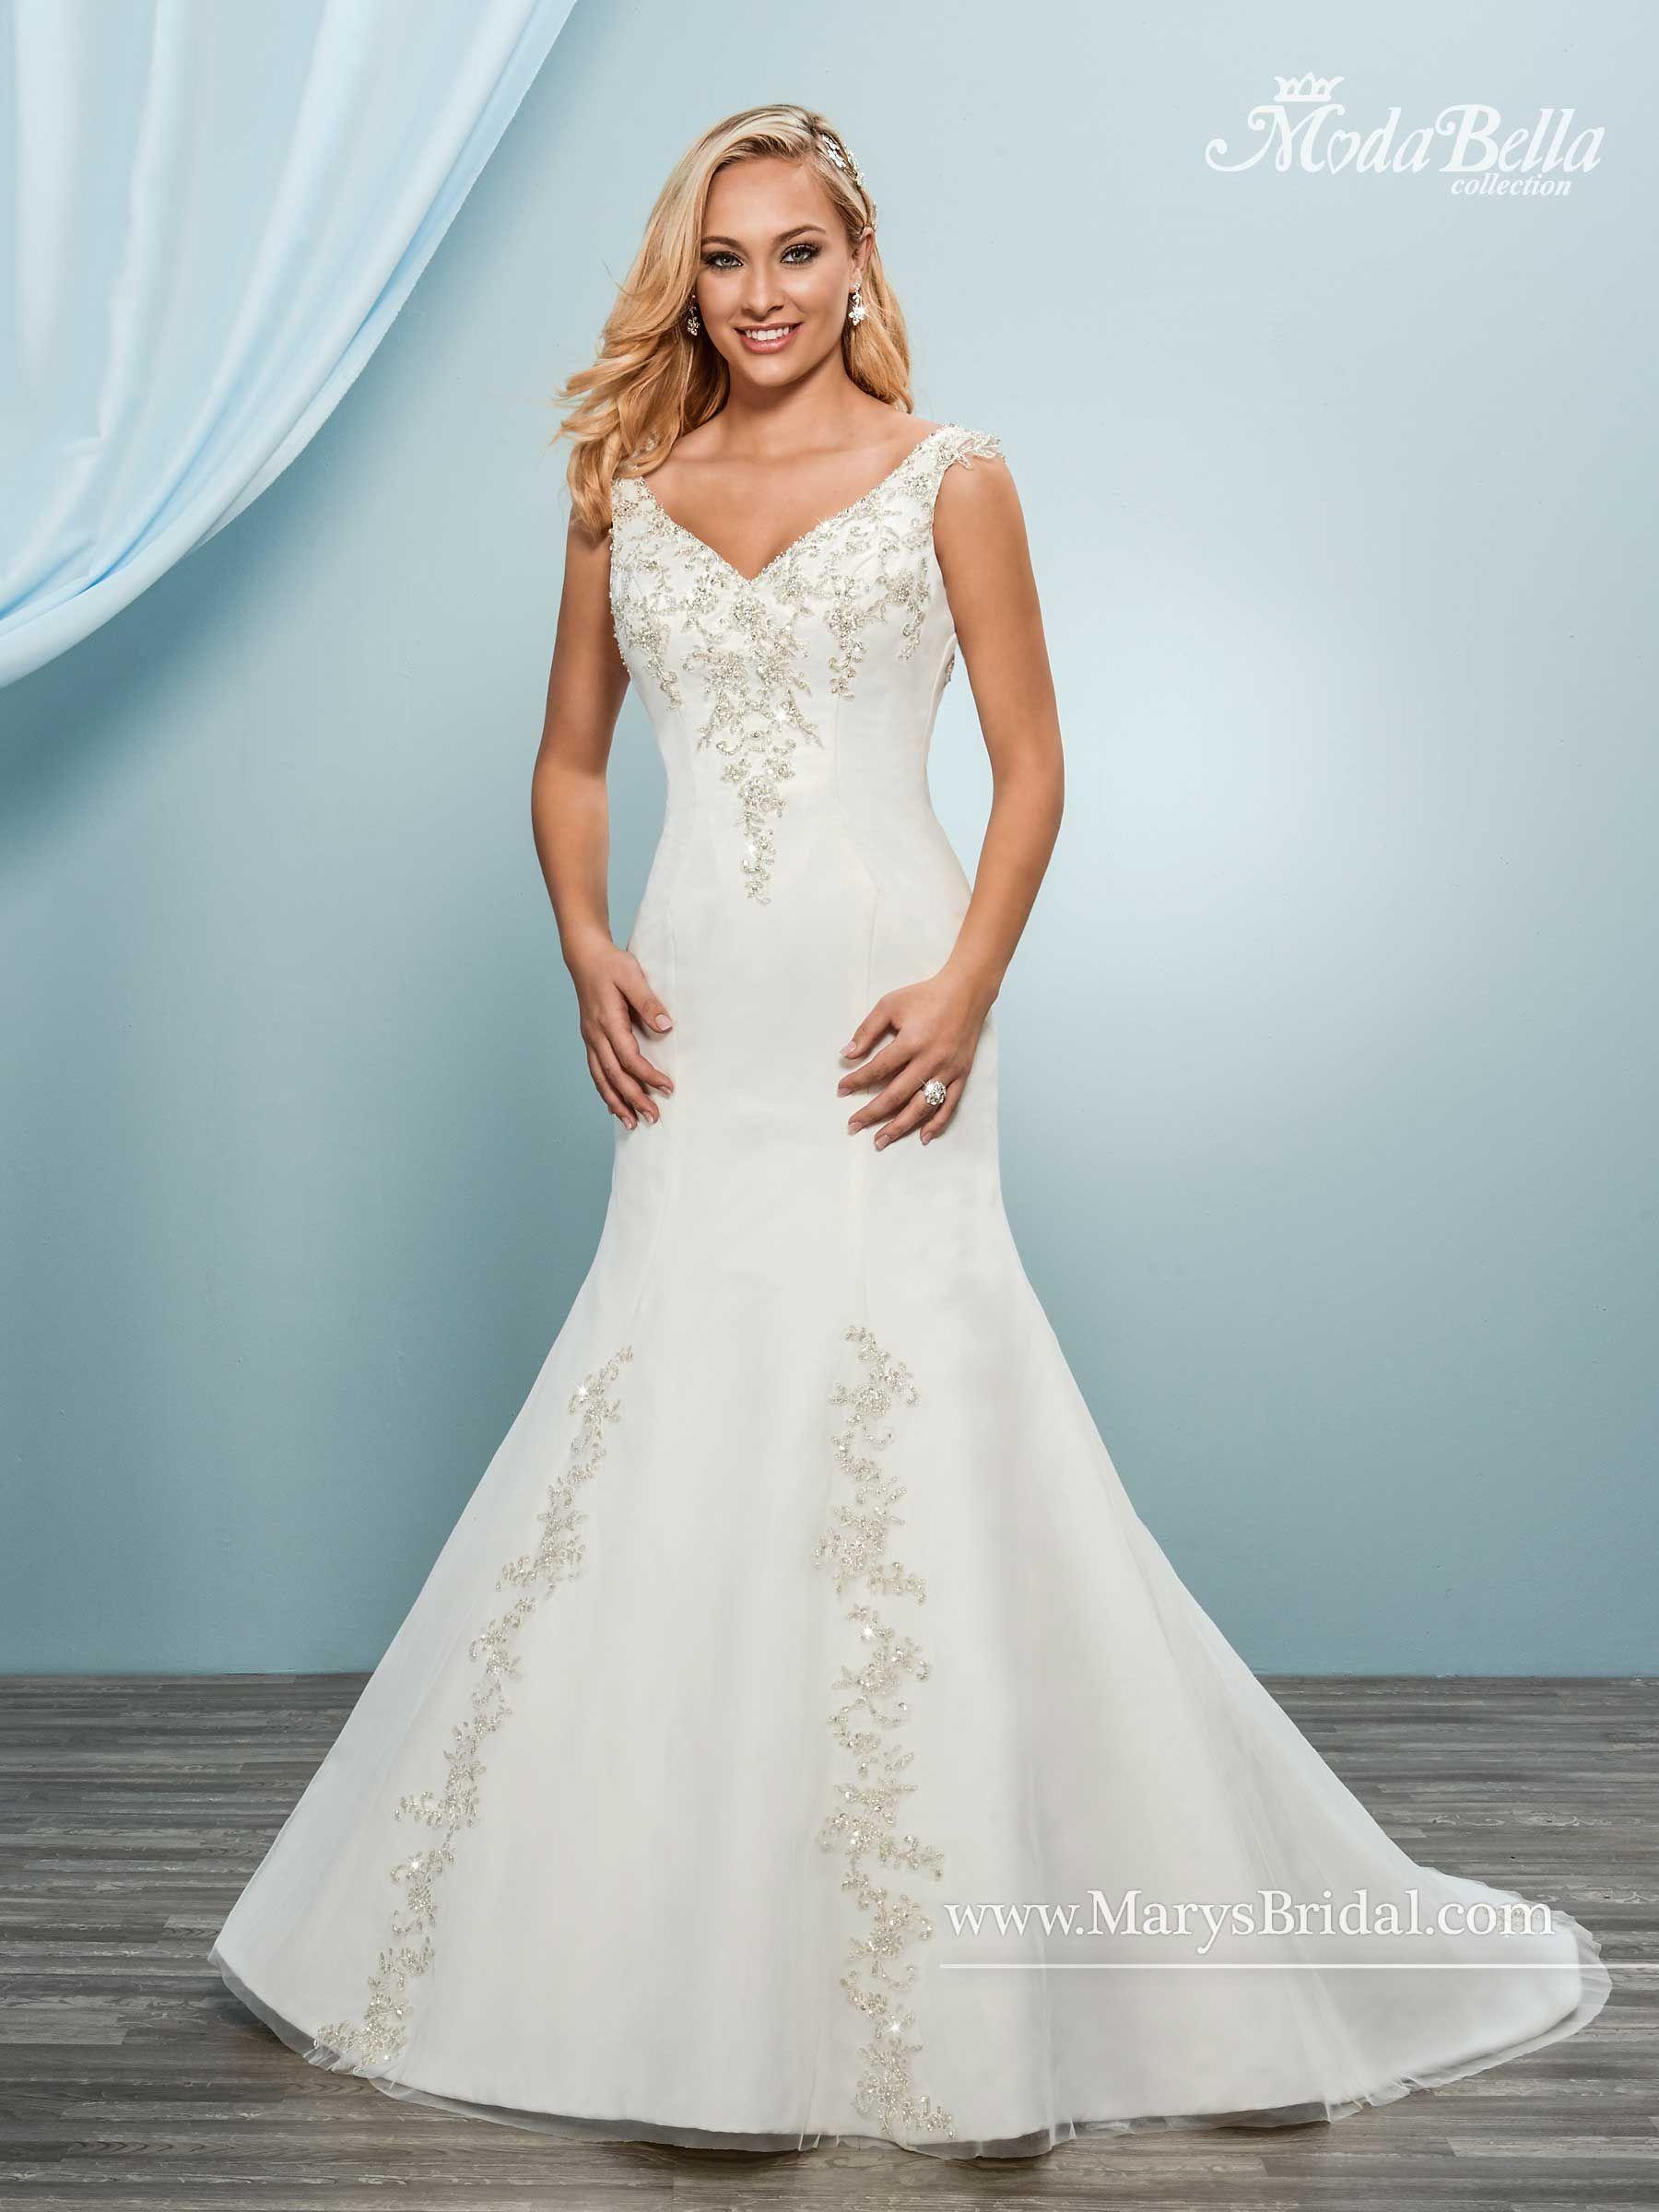 Mary\'s Bridal Gown - Moda Bella Style: 3Y631 (20)W, (16)I | novias ...